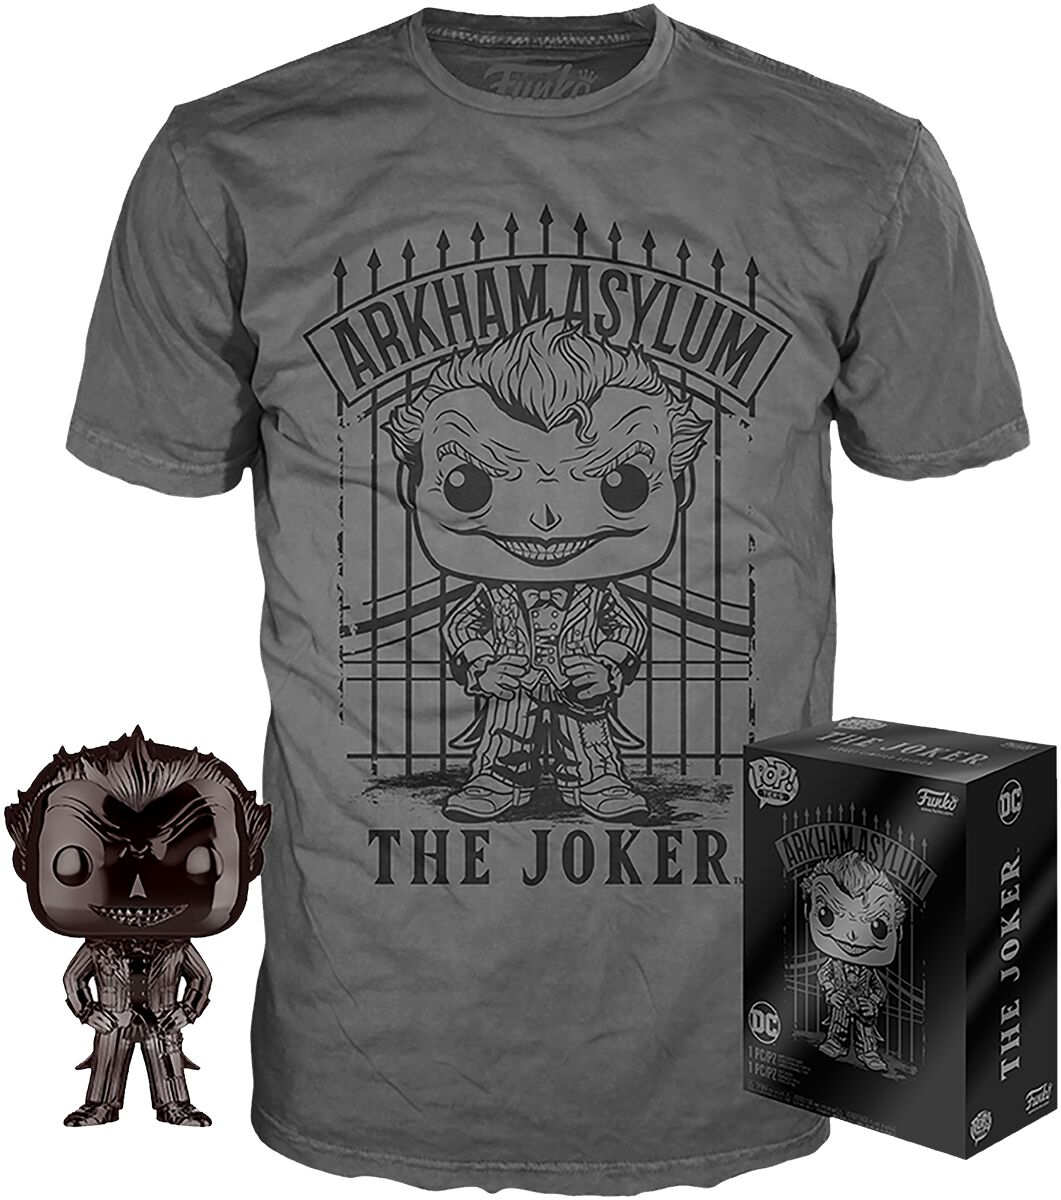 The Joker Chrome Joker T-Shirt plus Funko - Fan Paket  Fanpaket  Standard